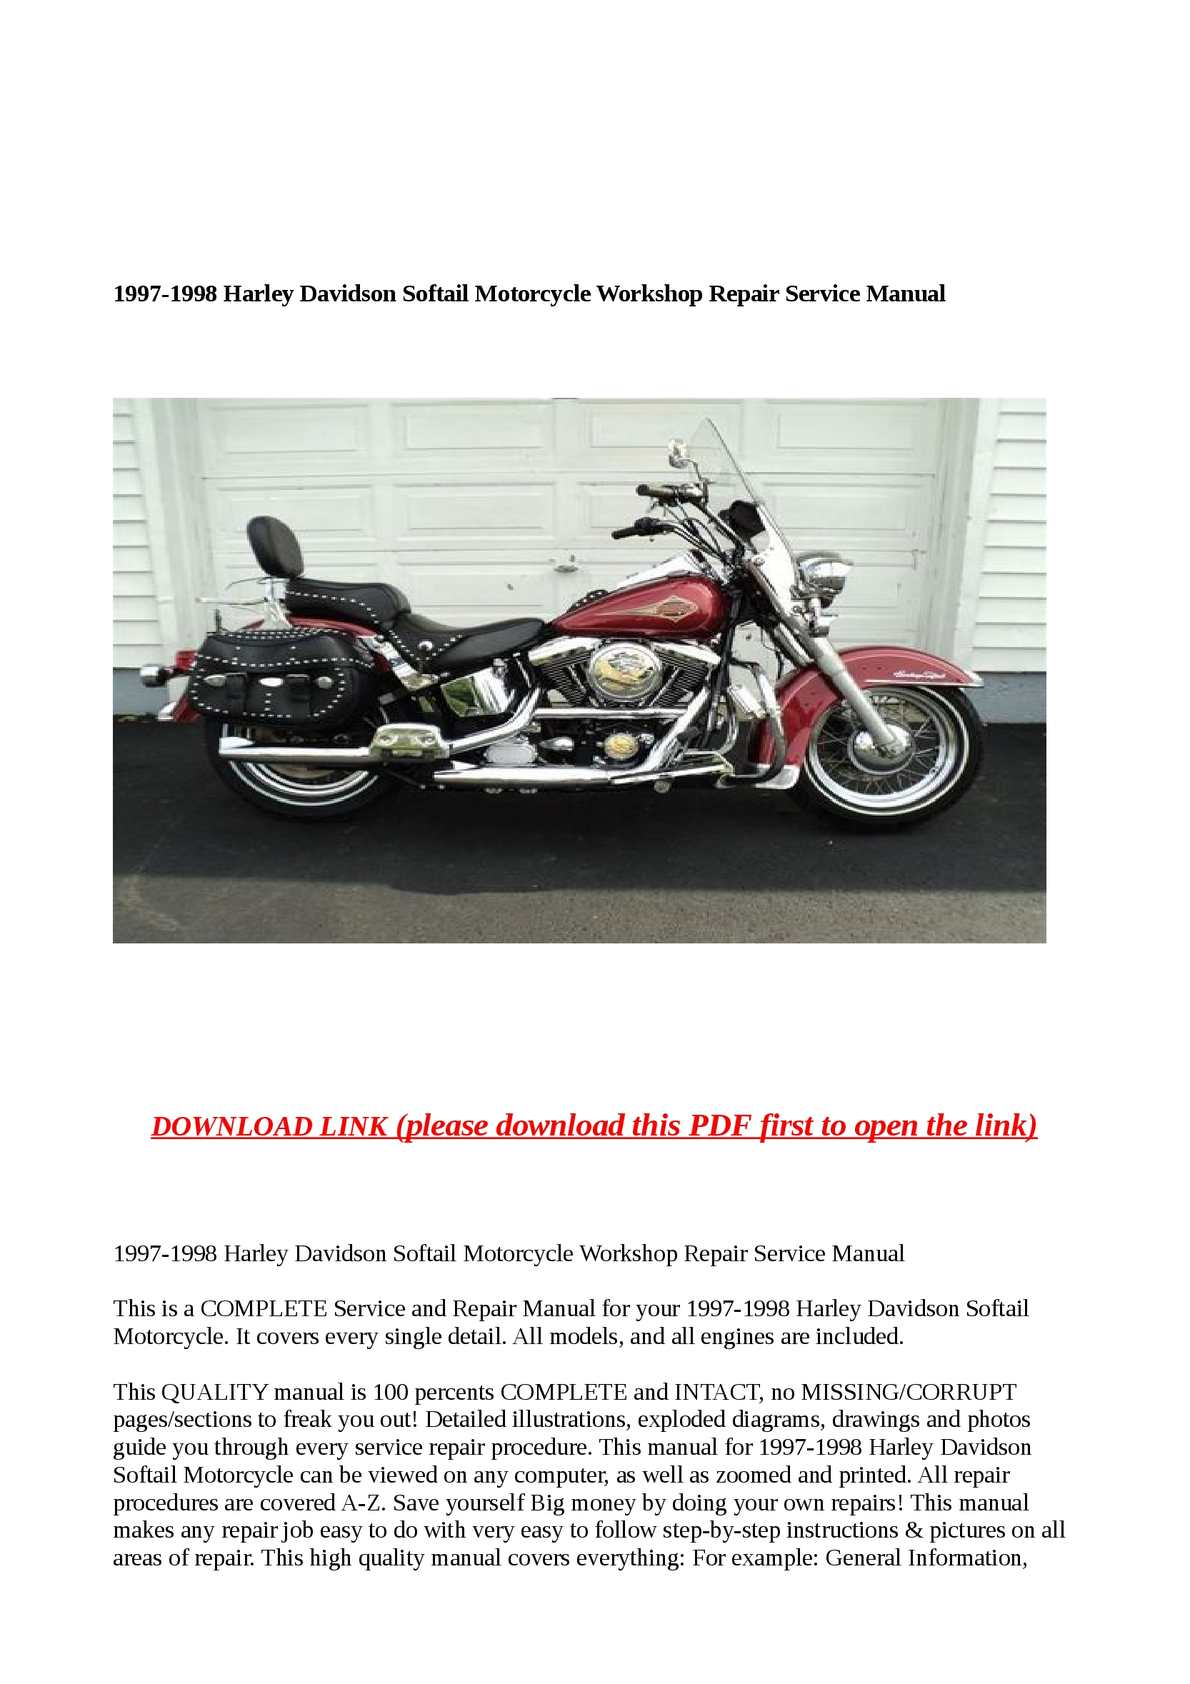 Calaméo - 1997-1998 Harley Davidson Softail Motorcycle Workshop Repair  Service Manual